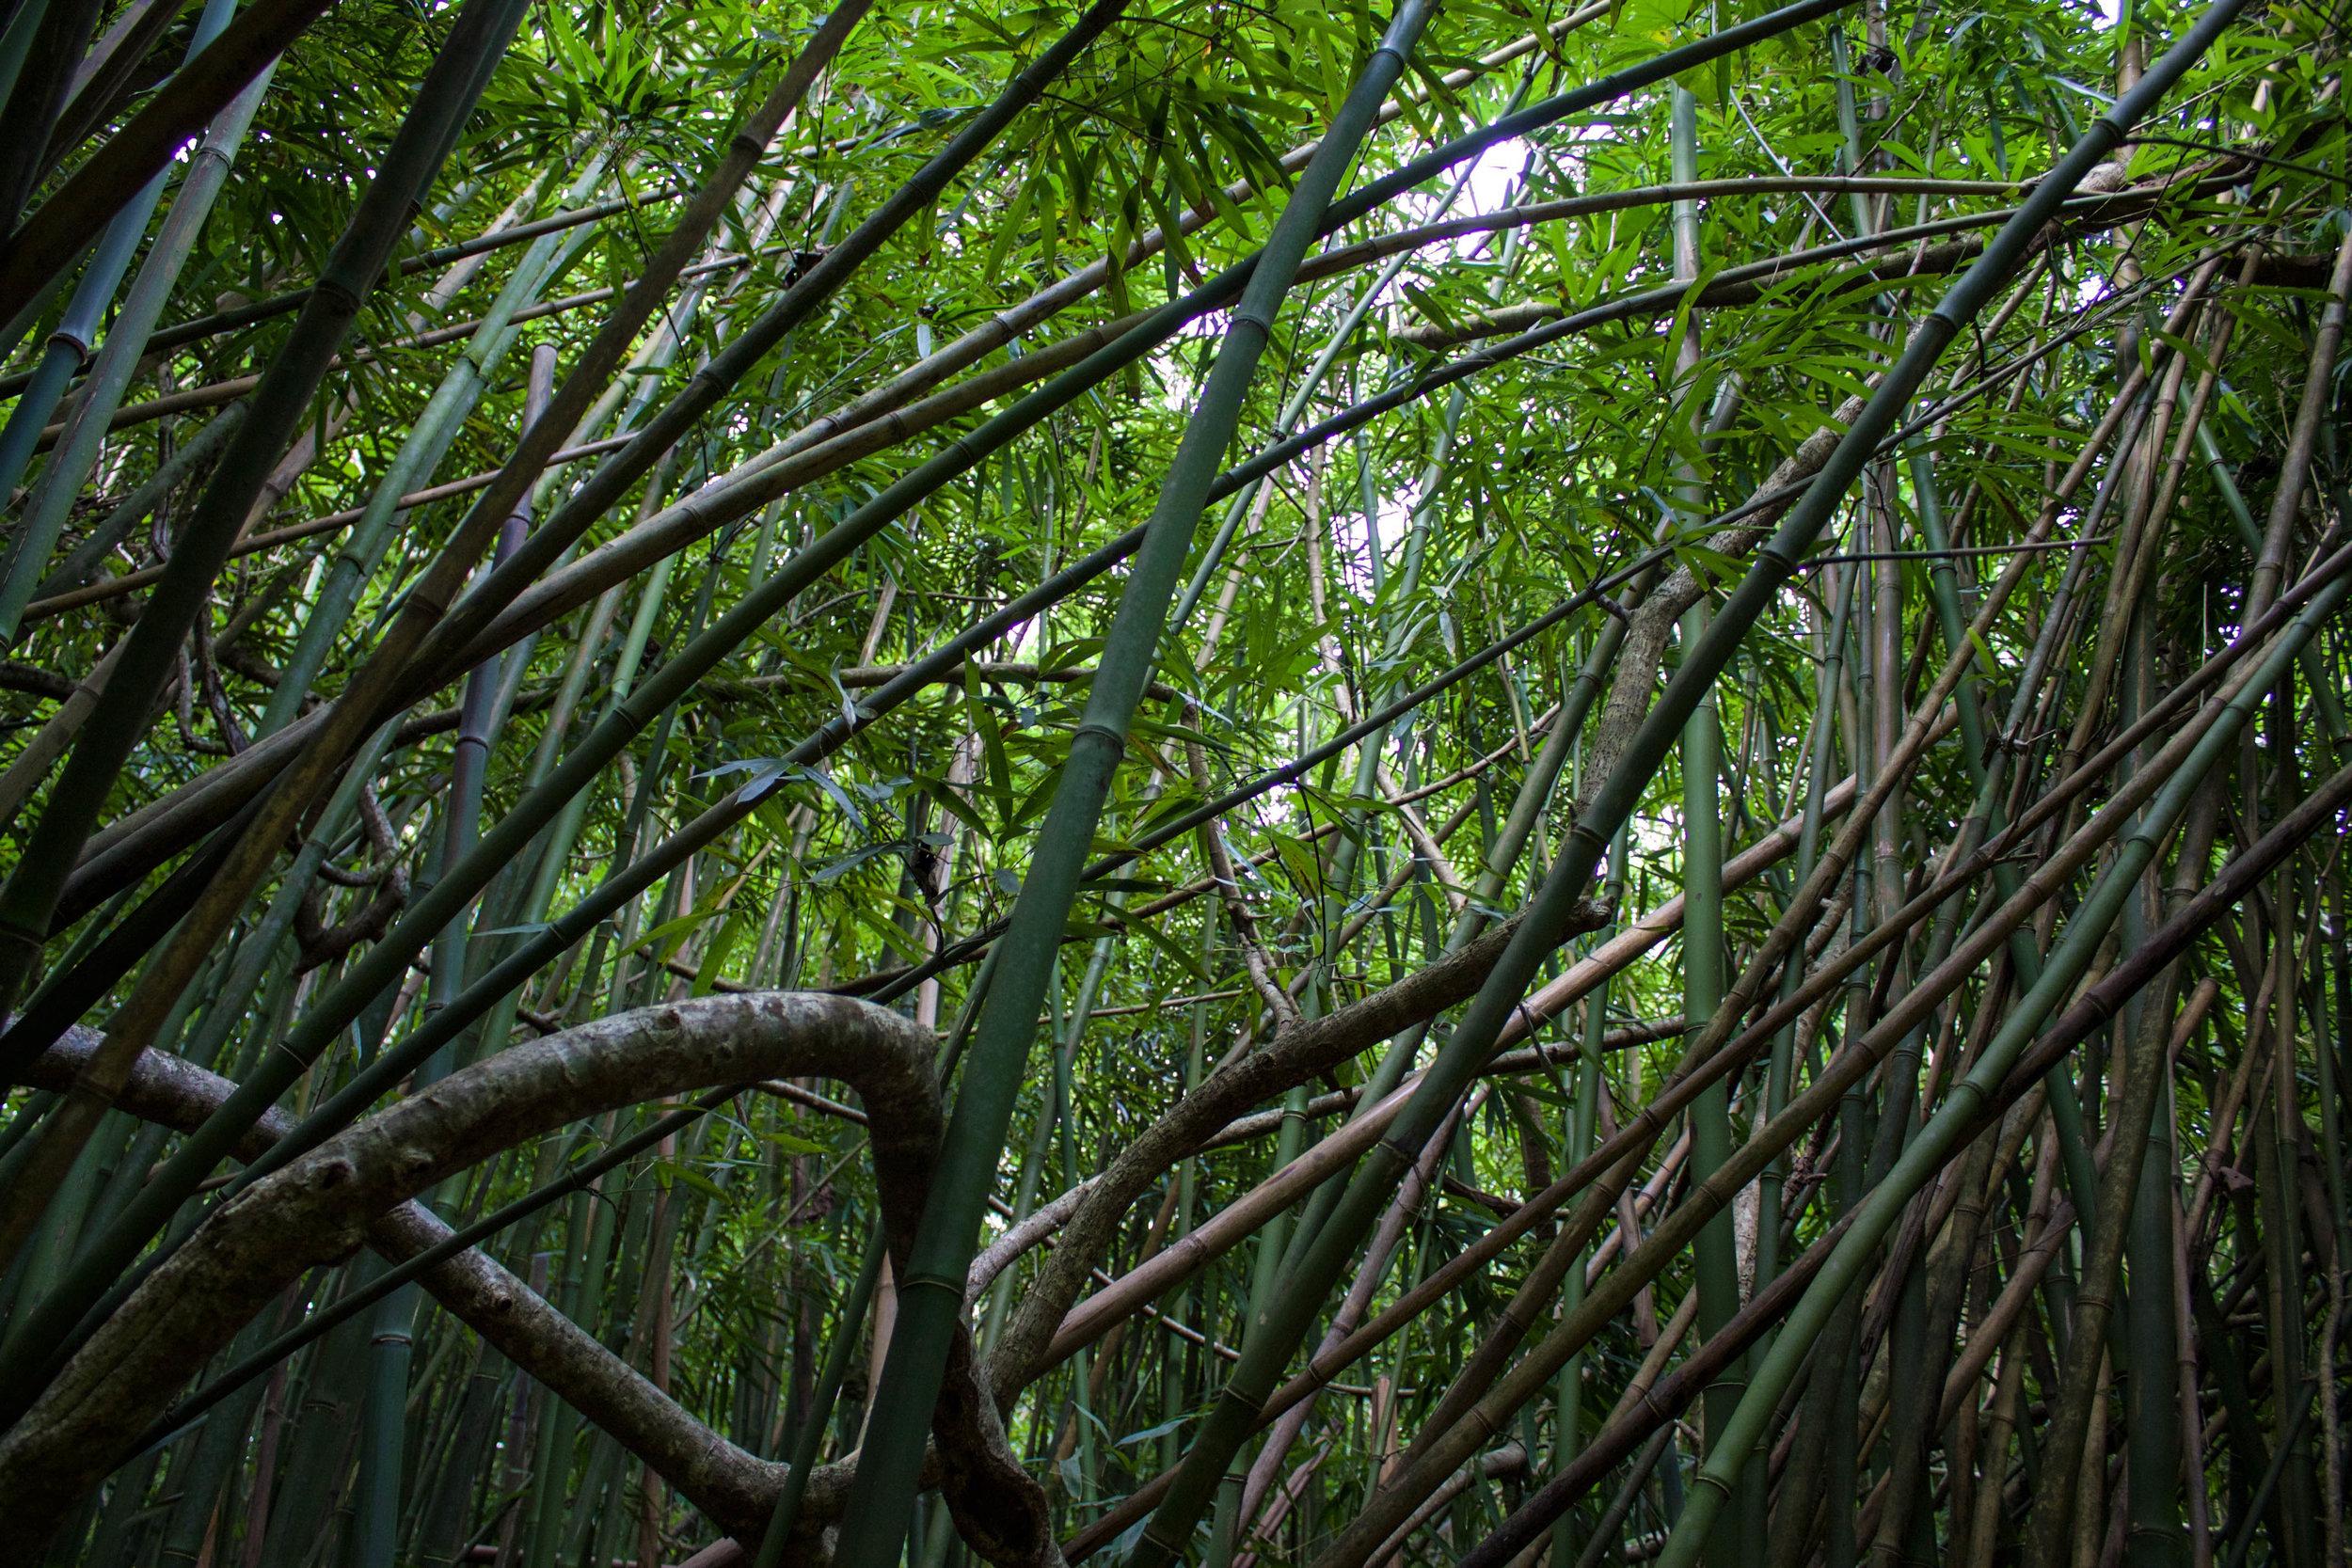 bamboo-forest-lulumahu-falls.jpg